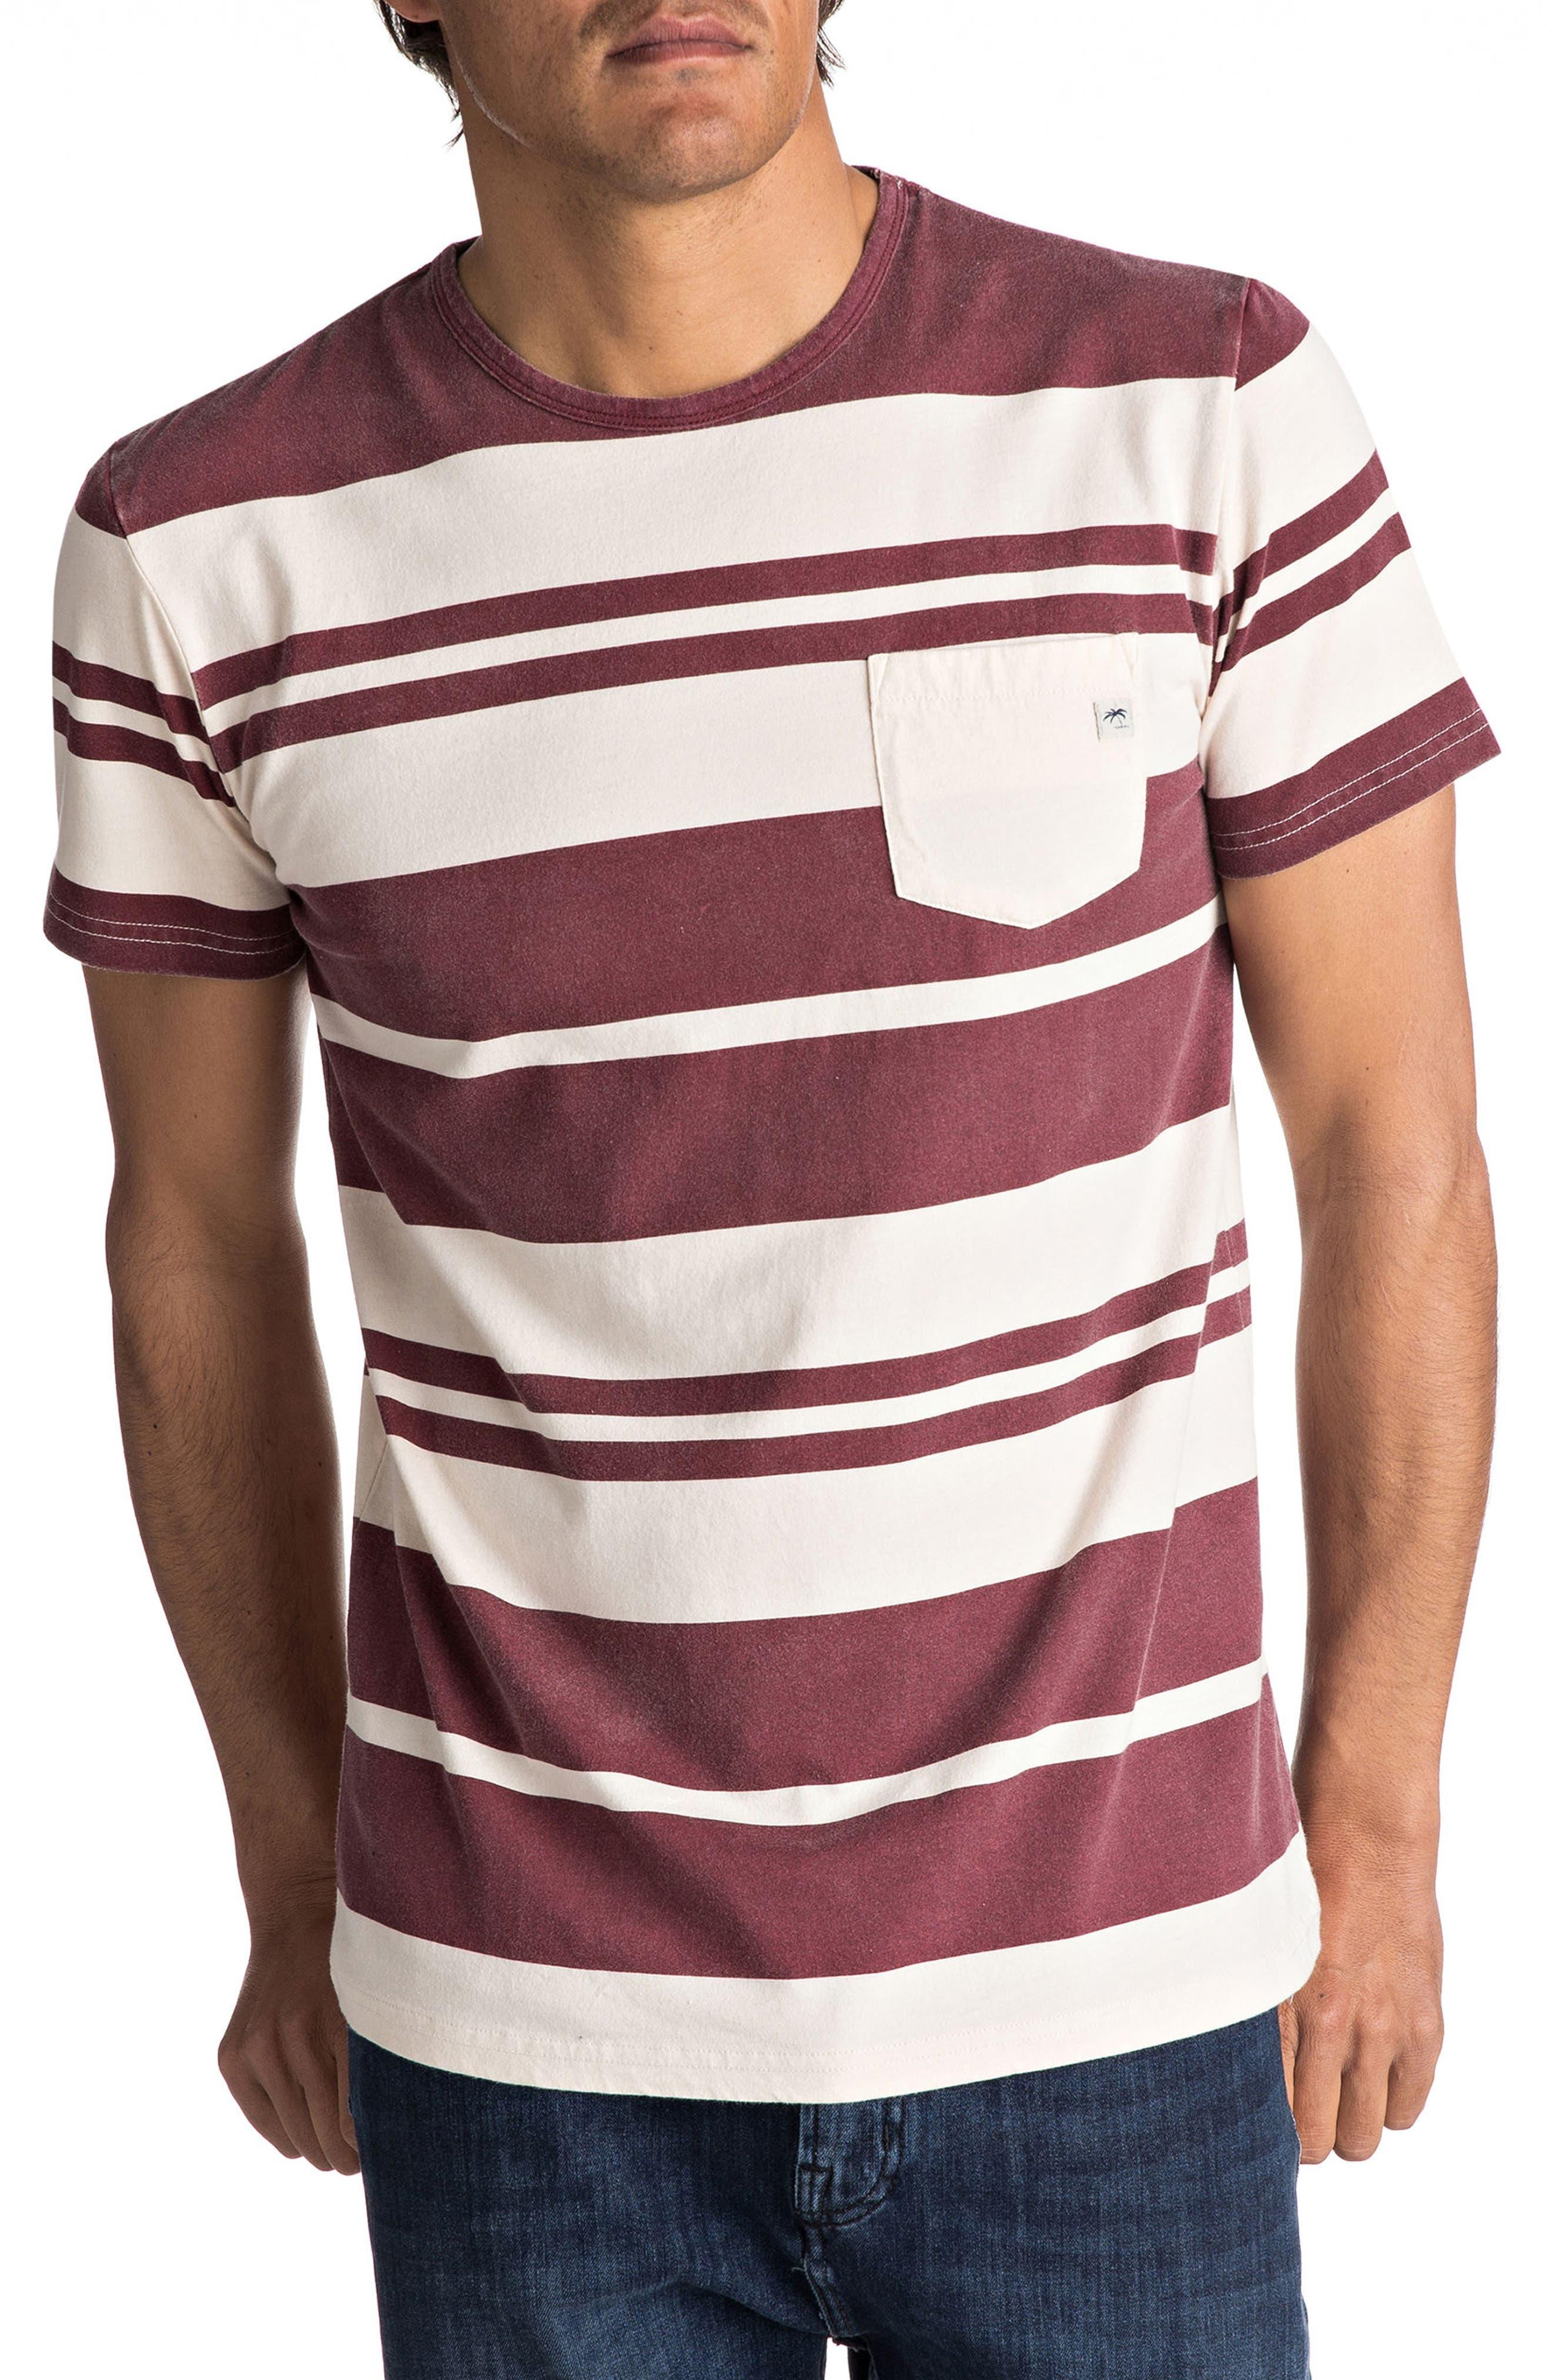 Lokea Stripe Pocket T-Shirt,                             Main thumbnail 1, color,                             Pomegranate Lokea